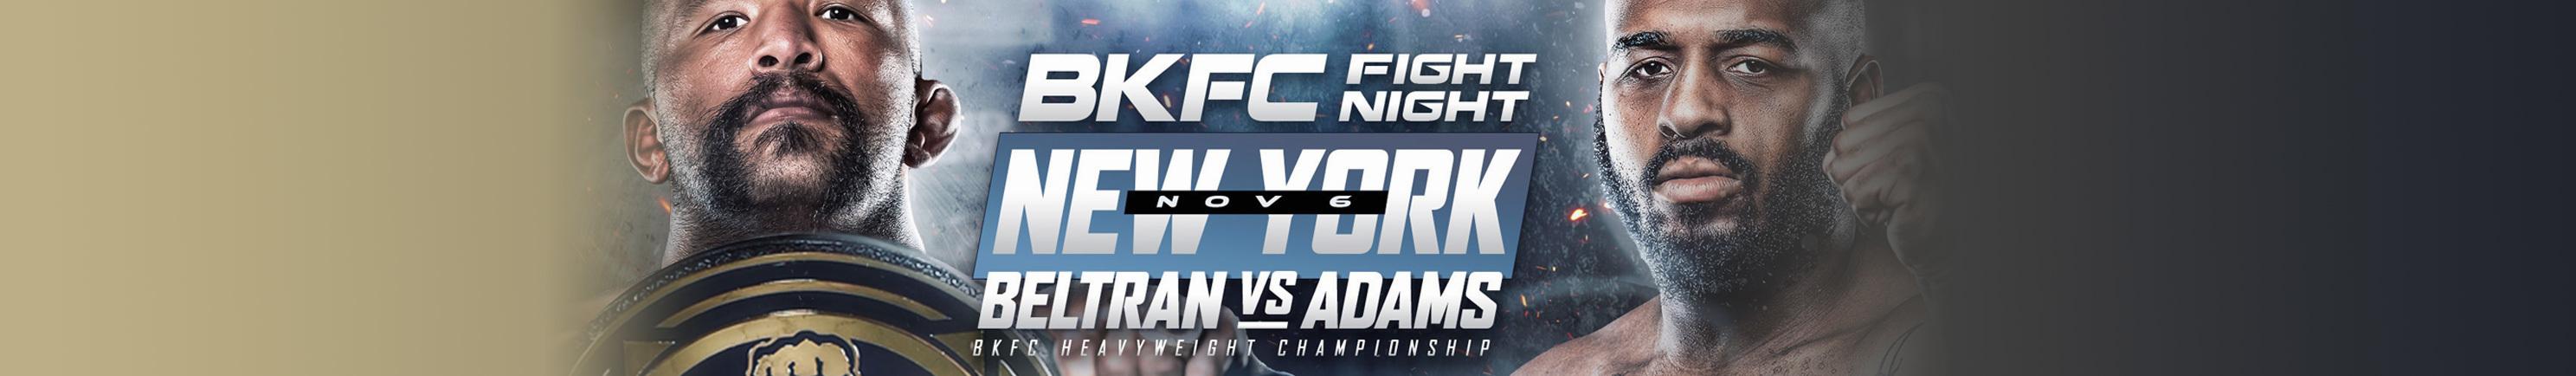 BKFC Fight Night NEW YORK